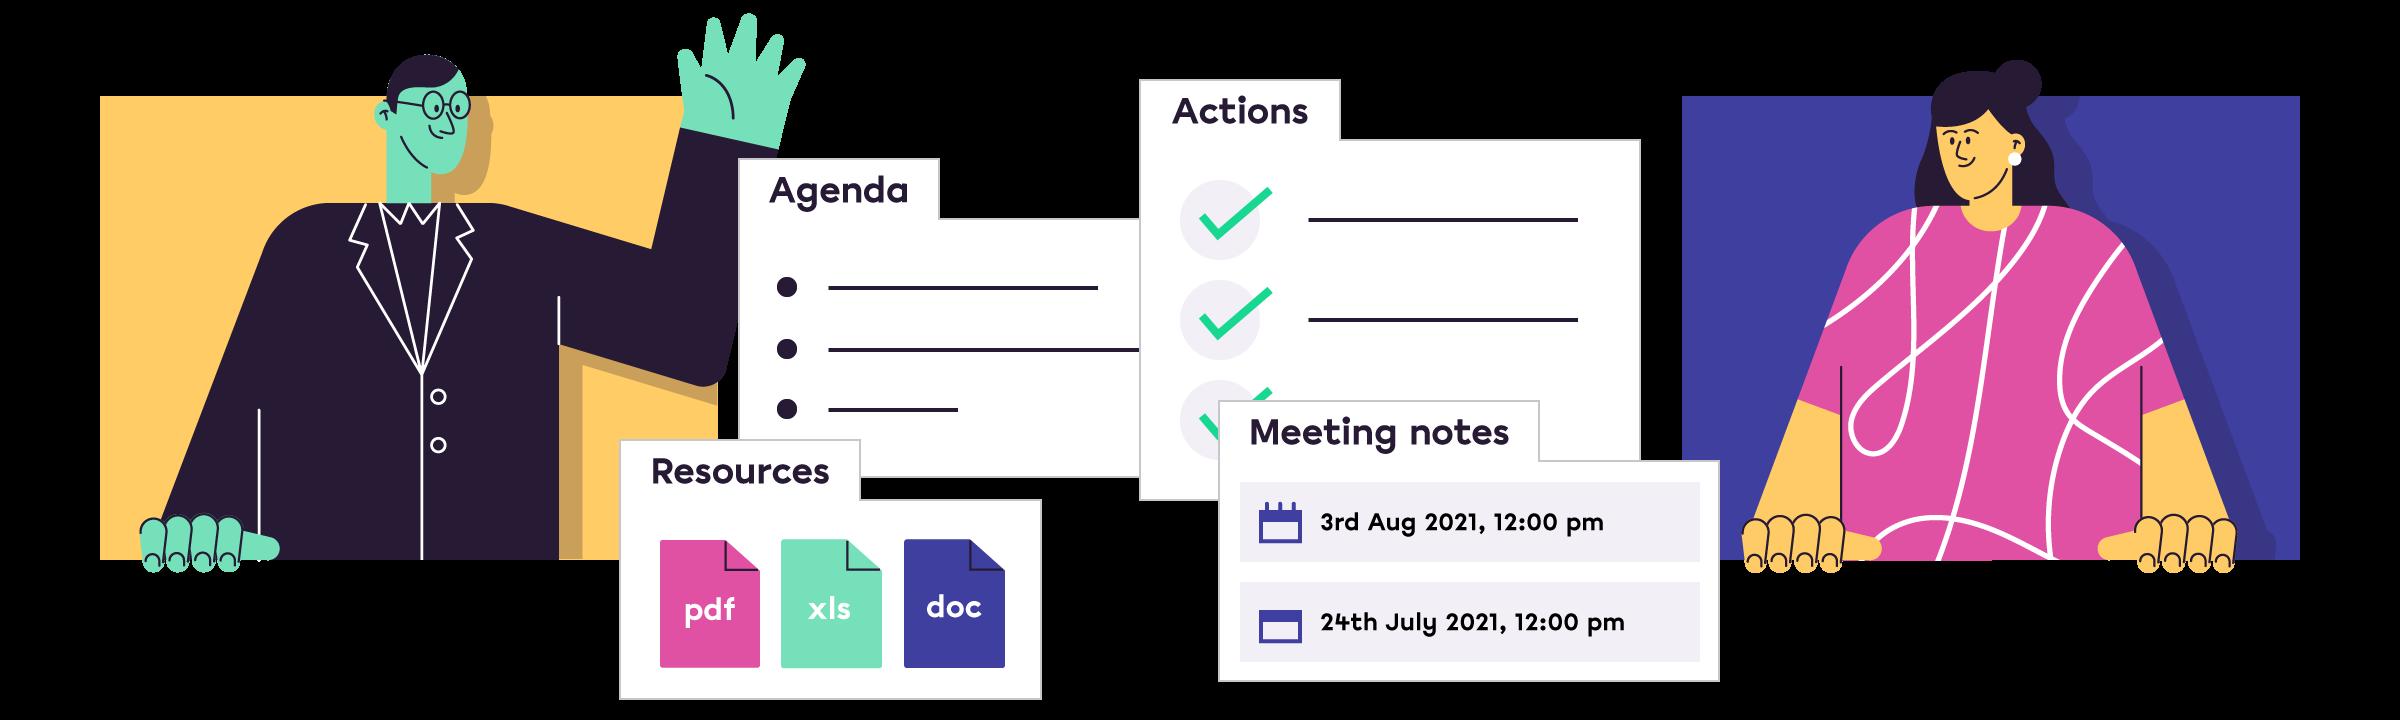 The client meeting platform